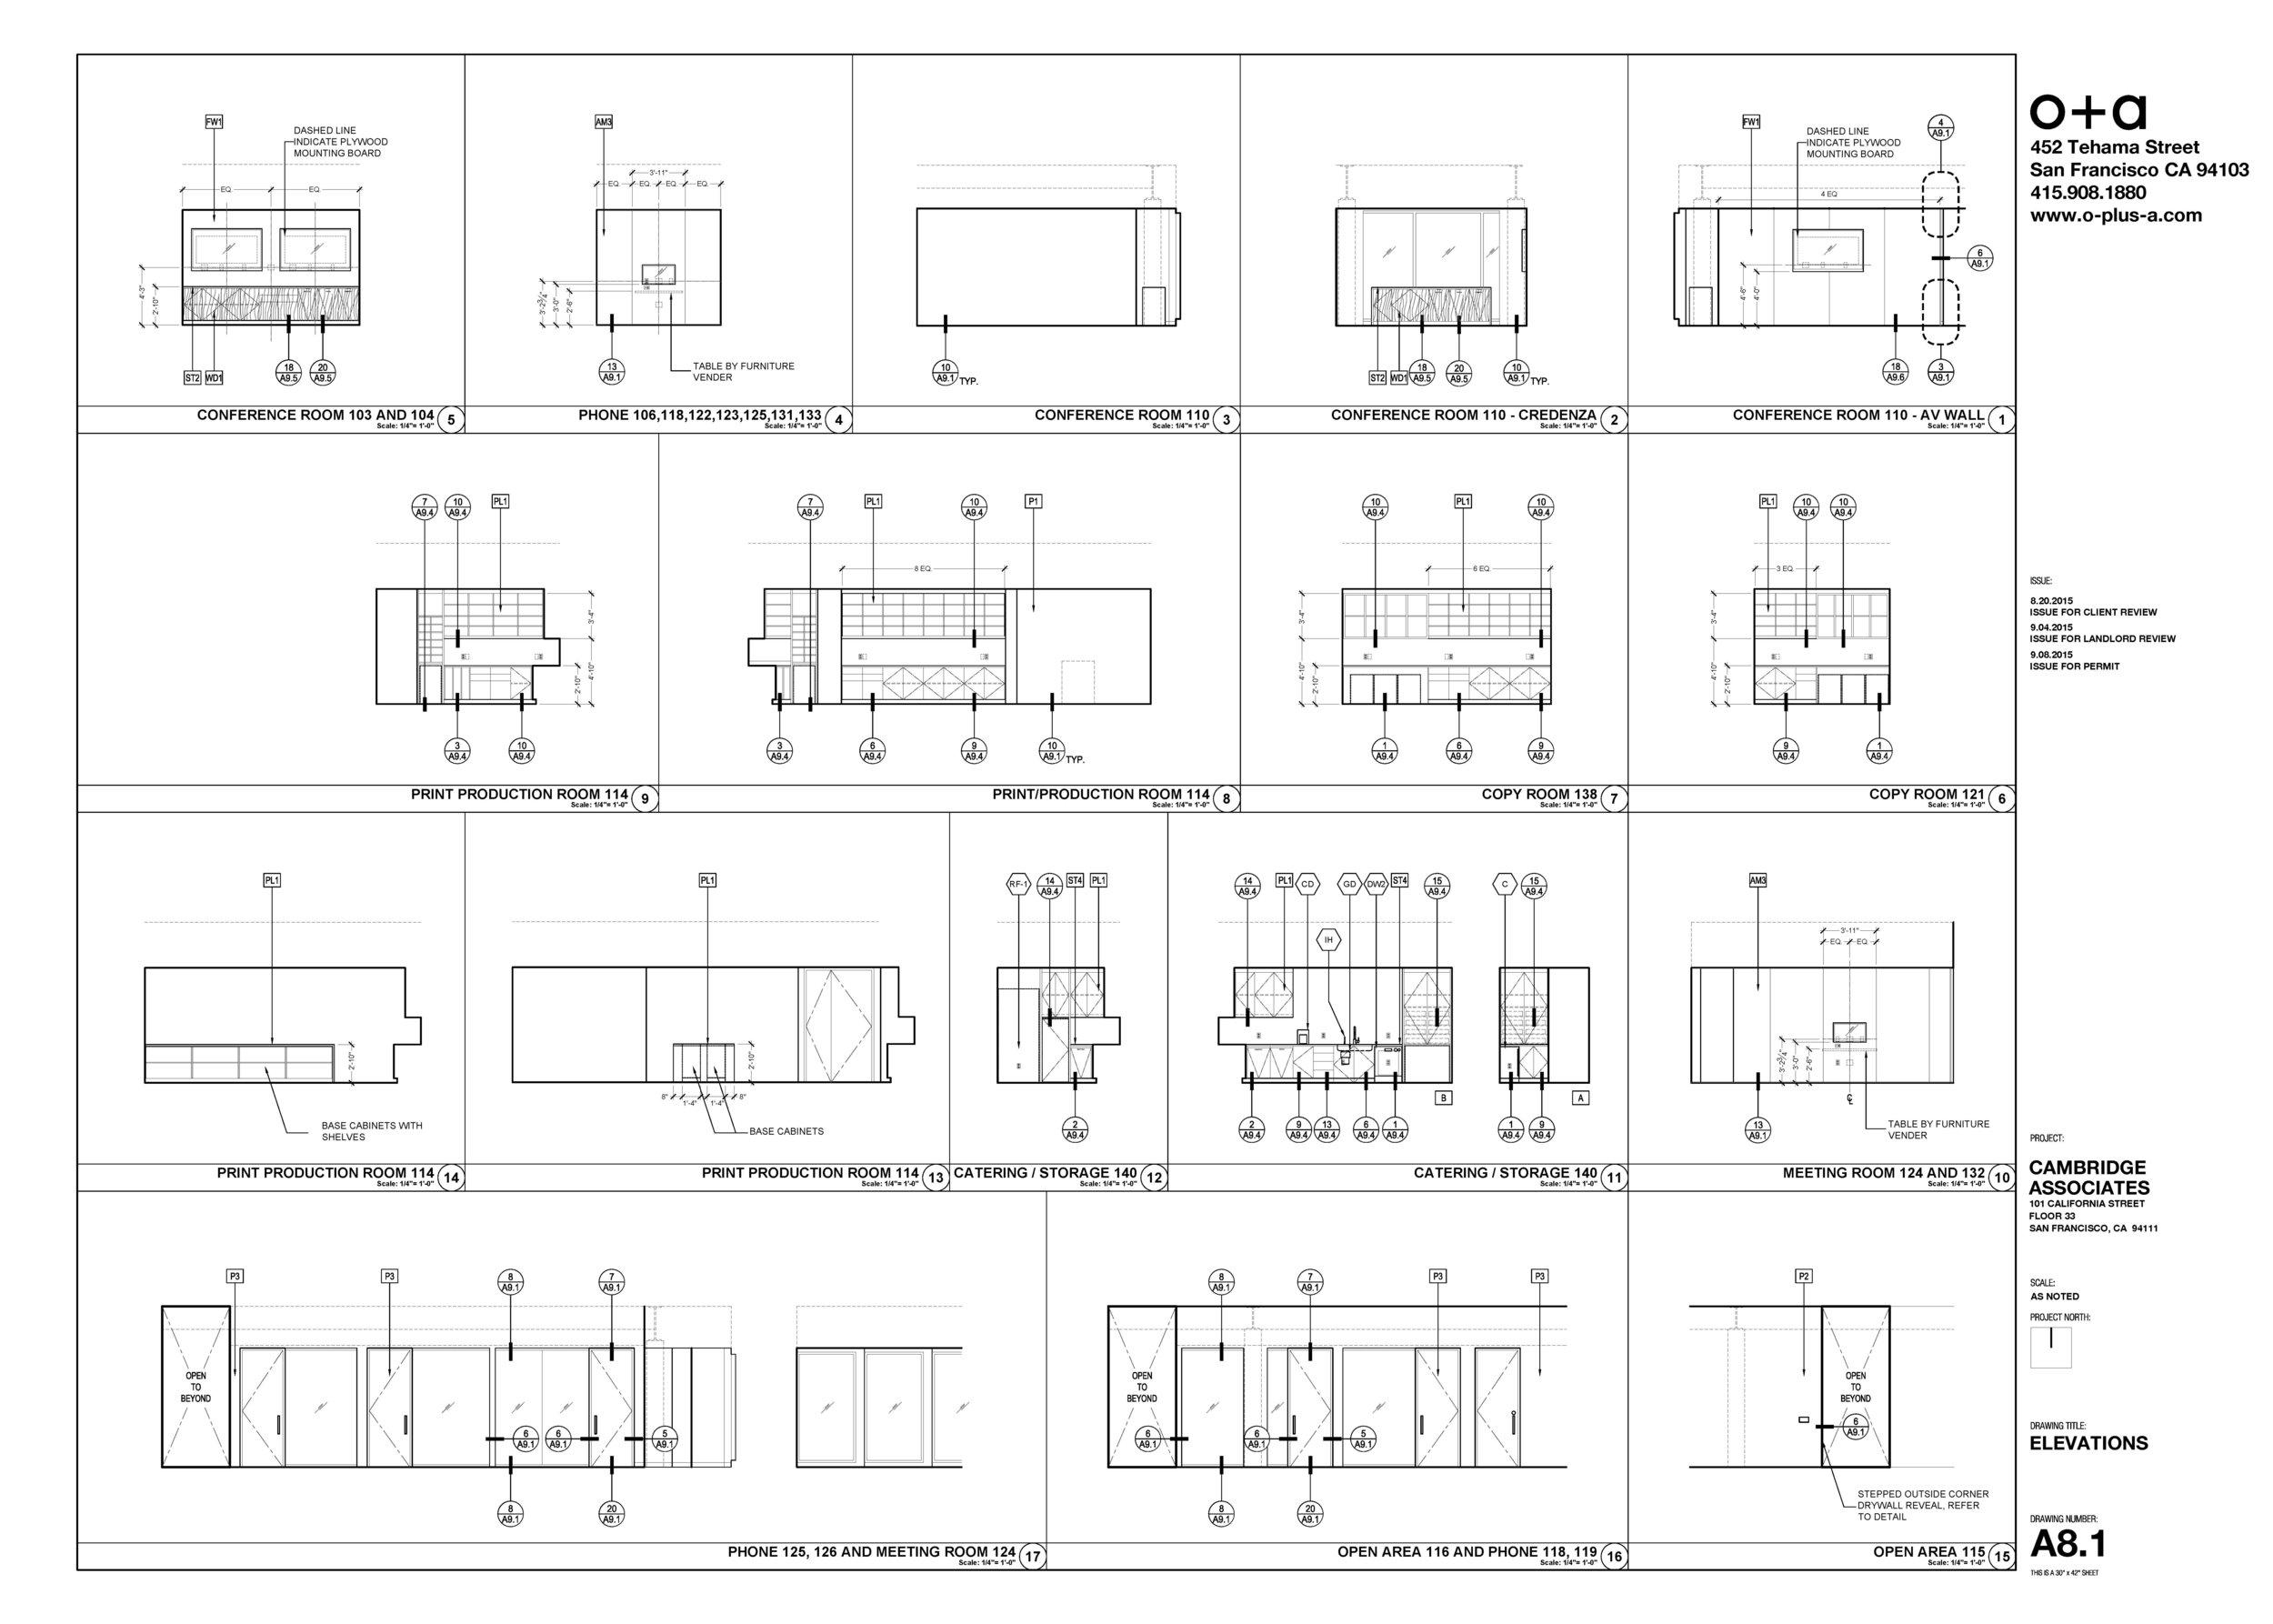 15-0908_CambridgeAssociates_SF_Permit Set_Page_14.jpg